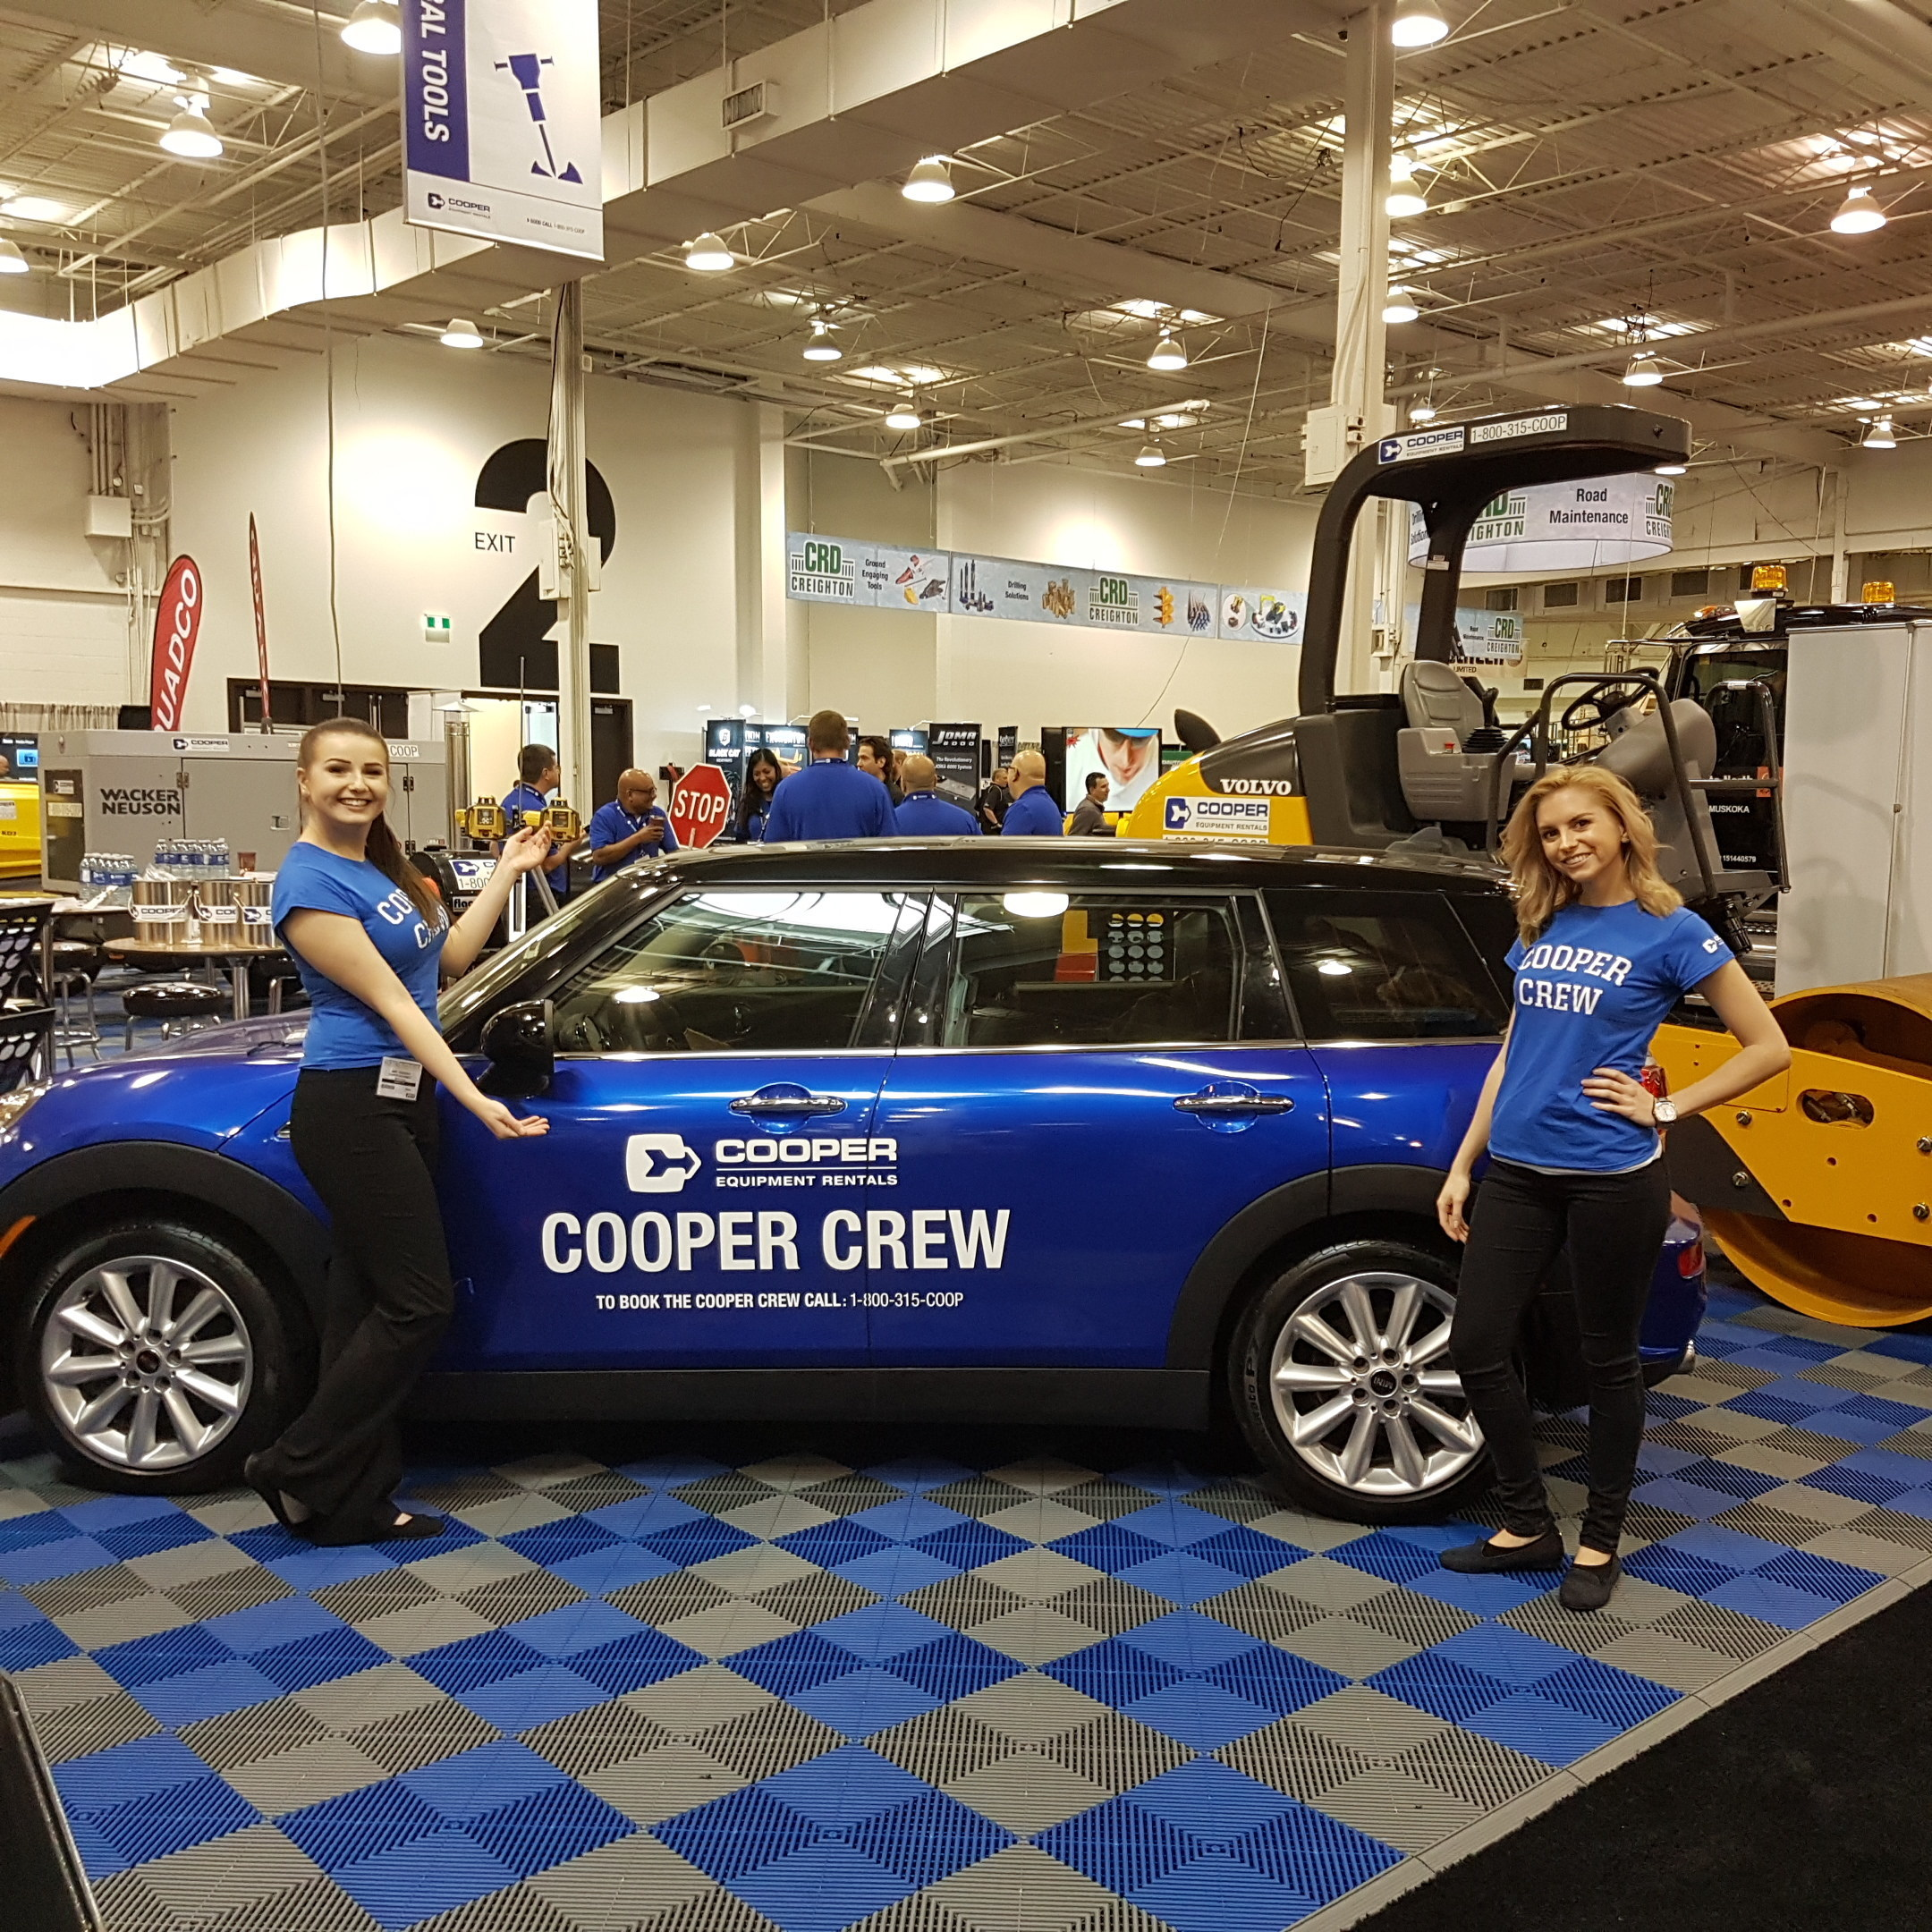 The cooper crew for Cooper rentals